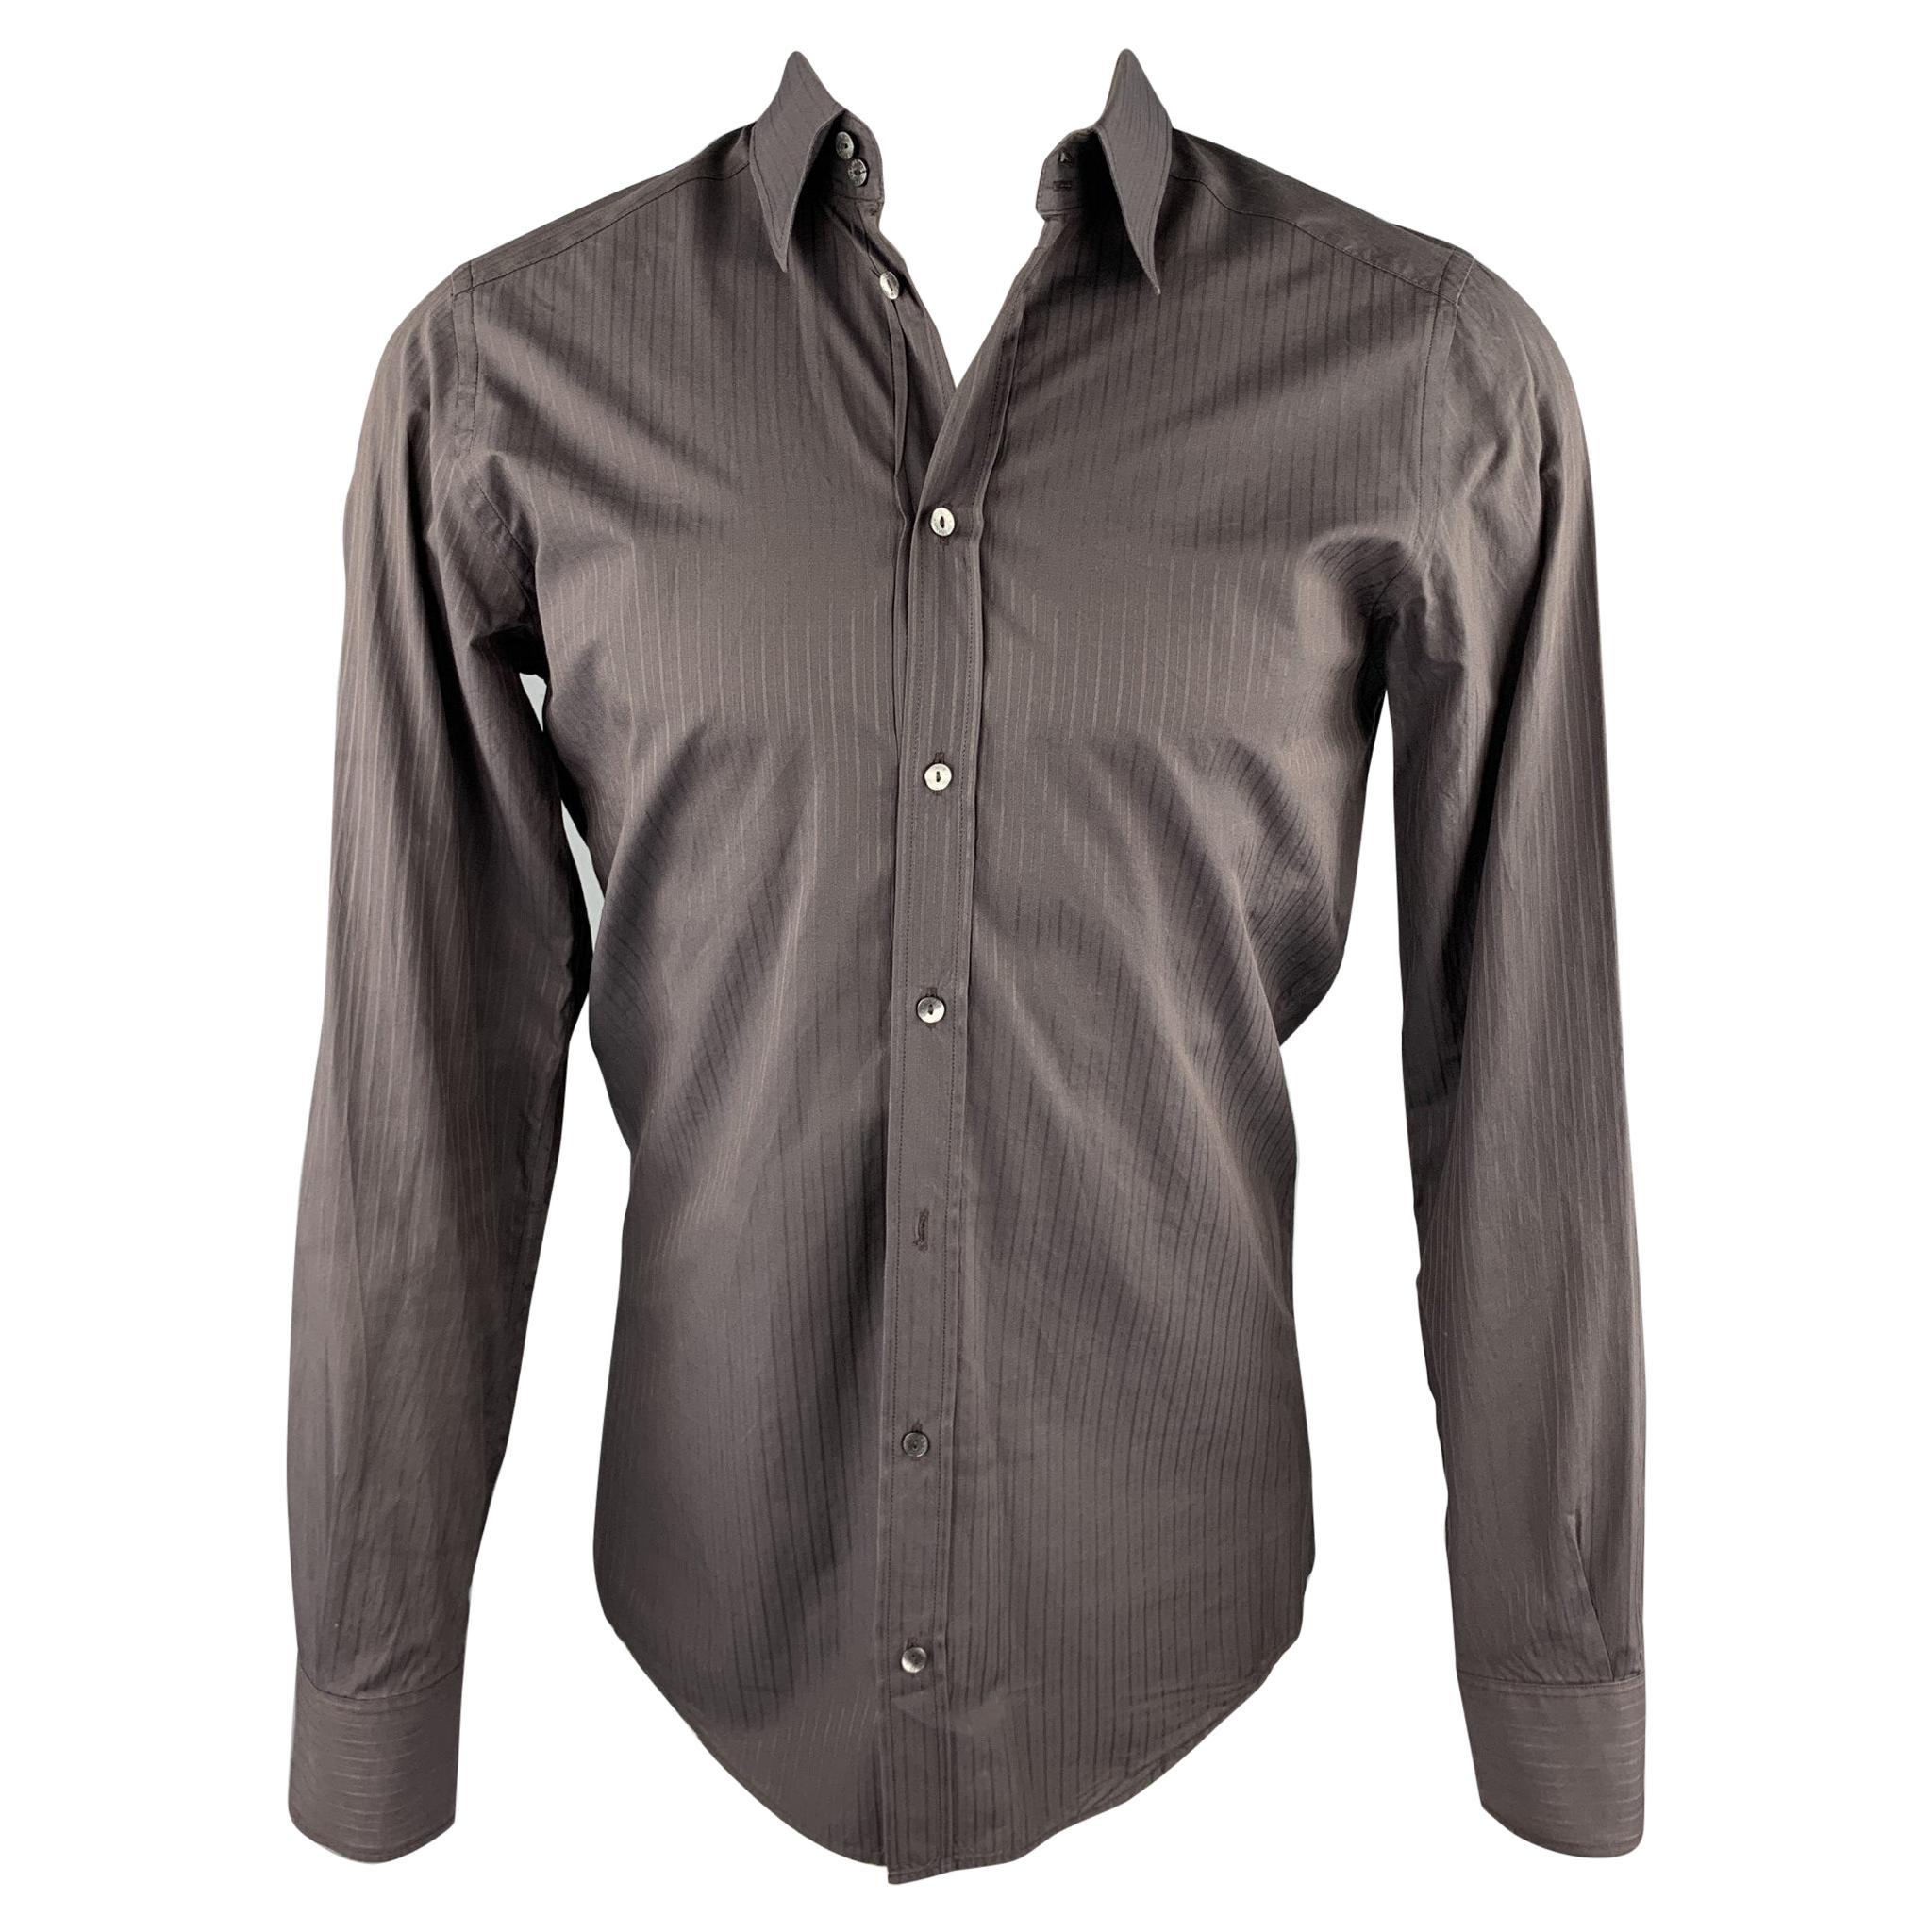 DOLCE & GABBANA Size S Brown Stripe Cotton Button Up Long Sleeve Shirt